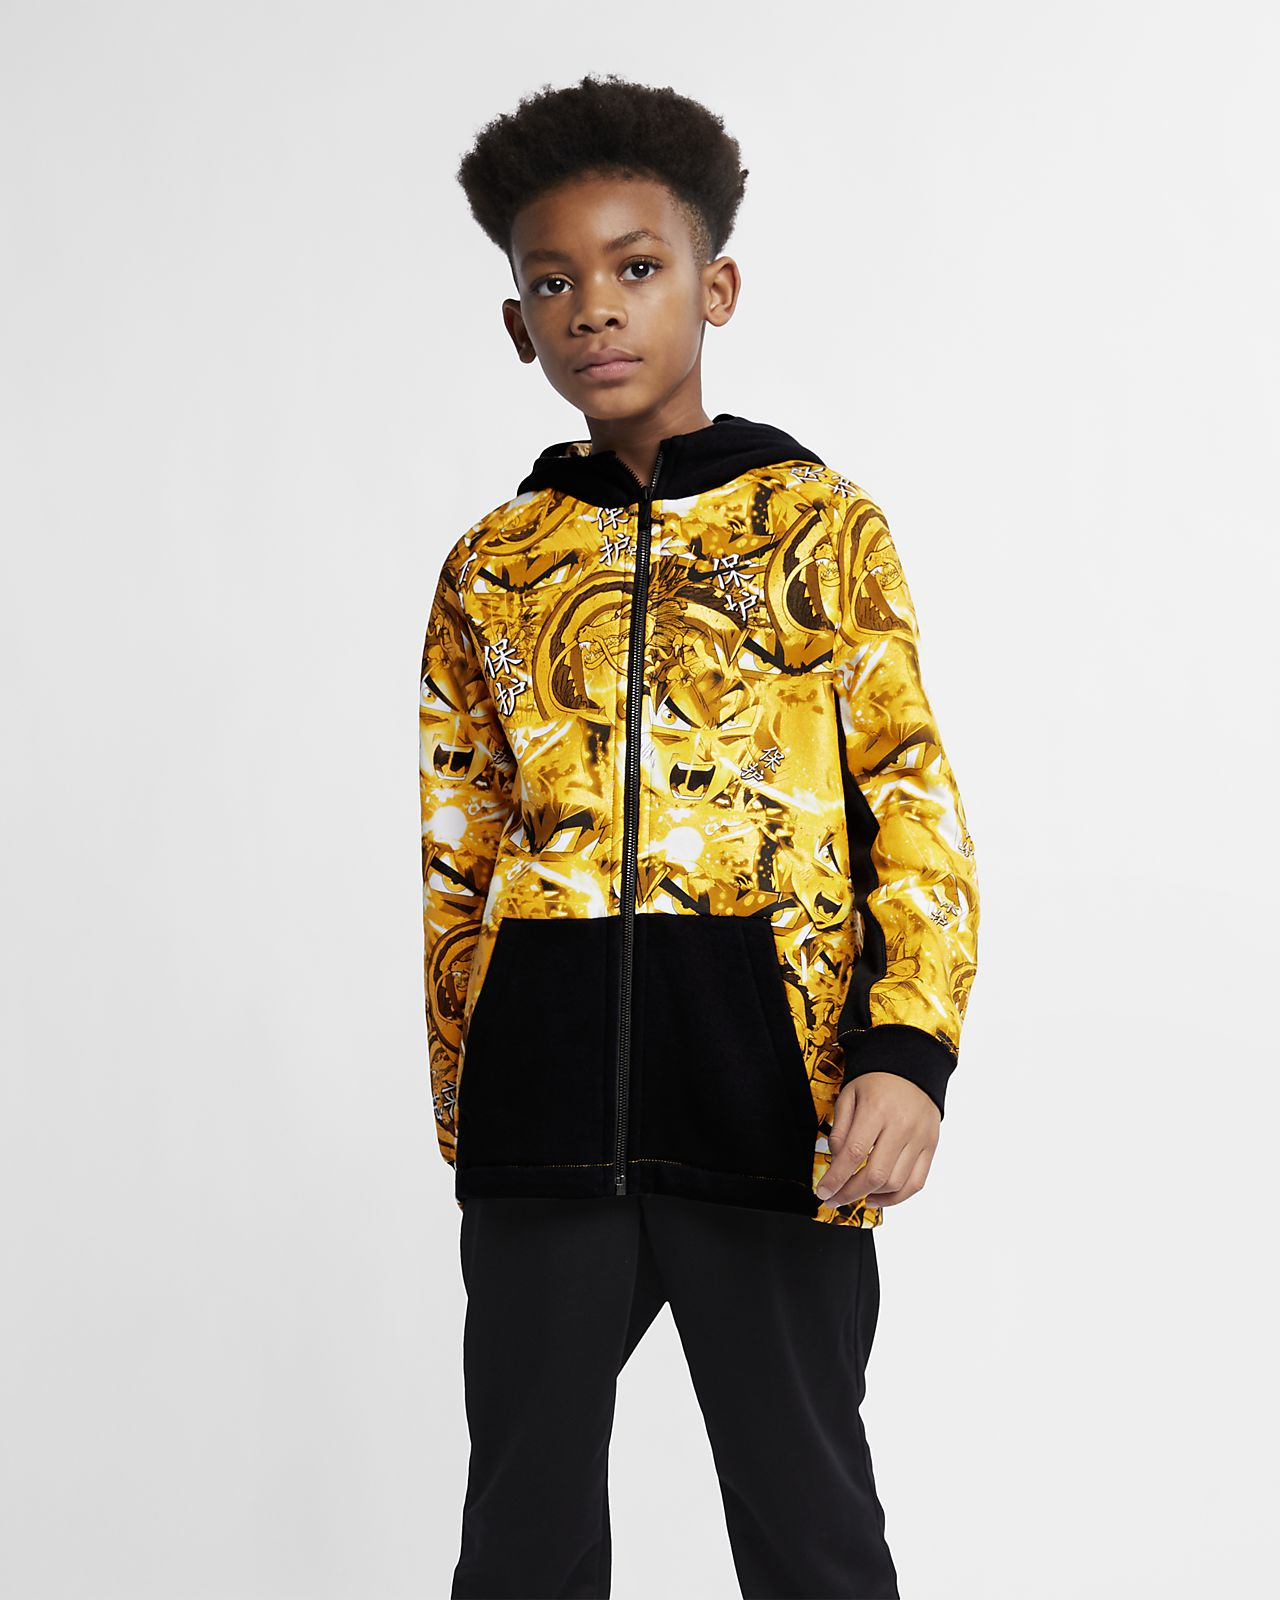 3da4eddd0f4c Donovon s Nike Sportswear (Doernbecher Freestyle) (Big Kids ) Boys ...